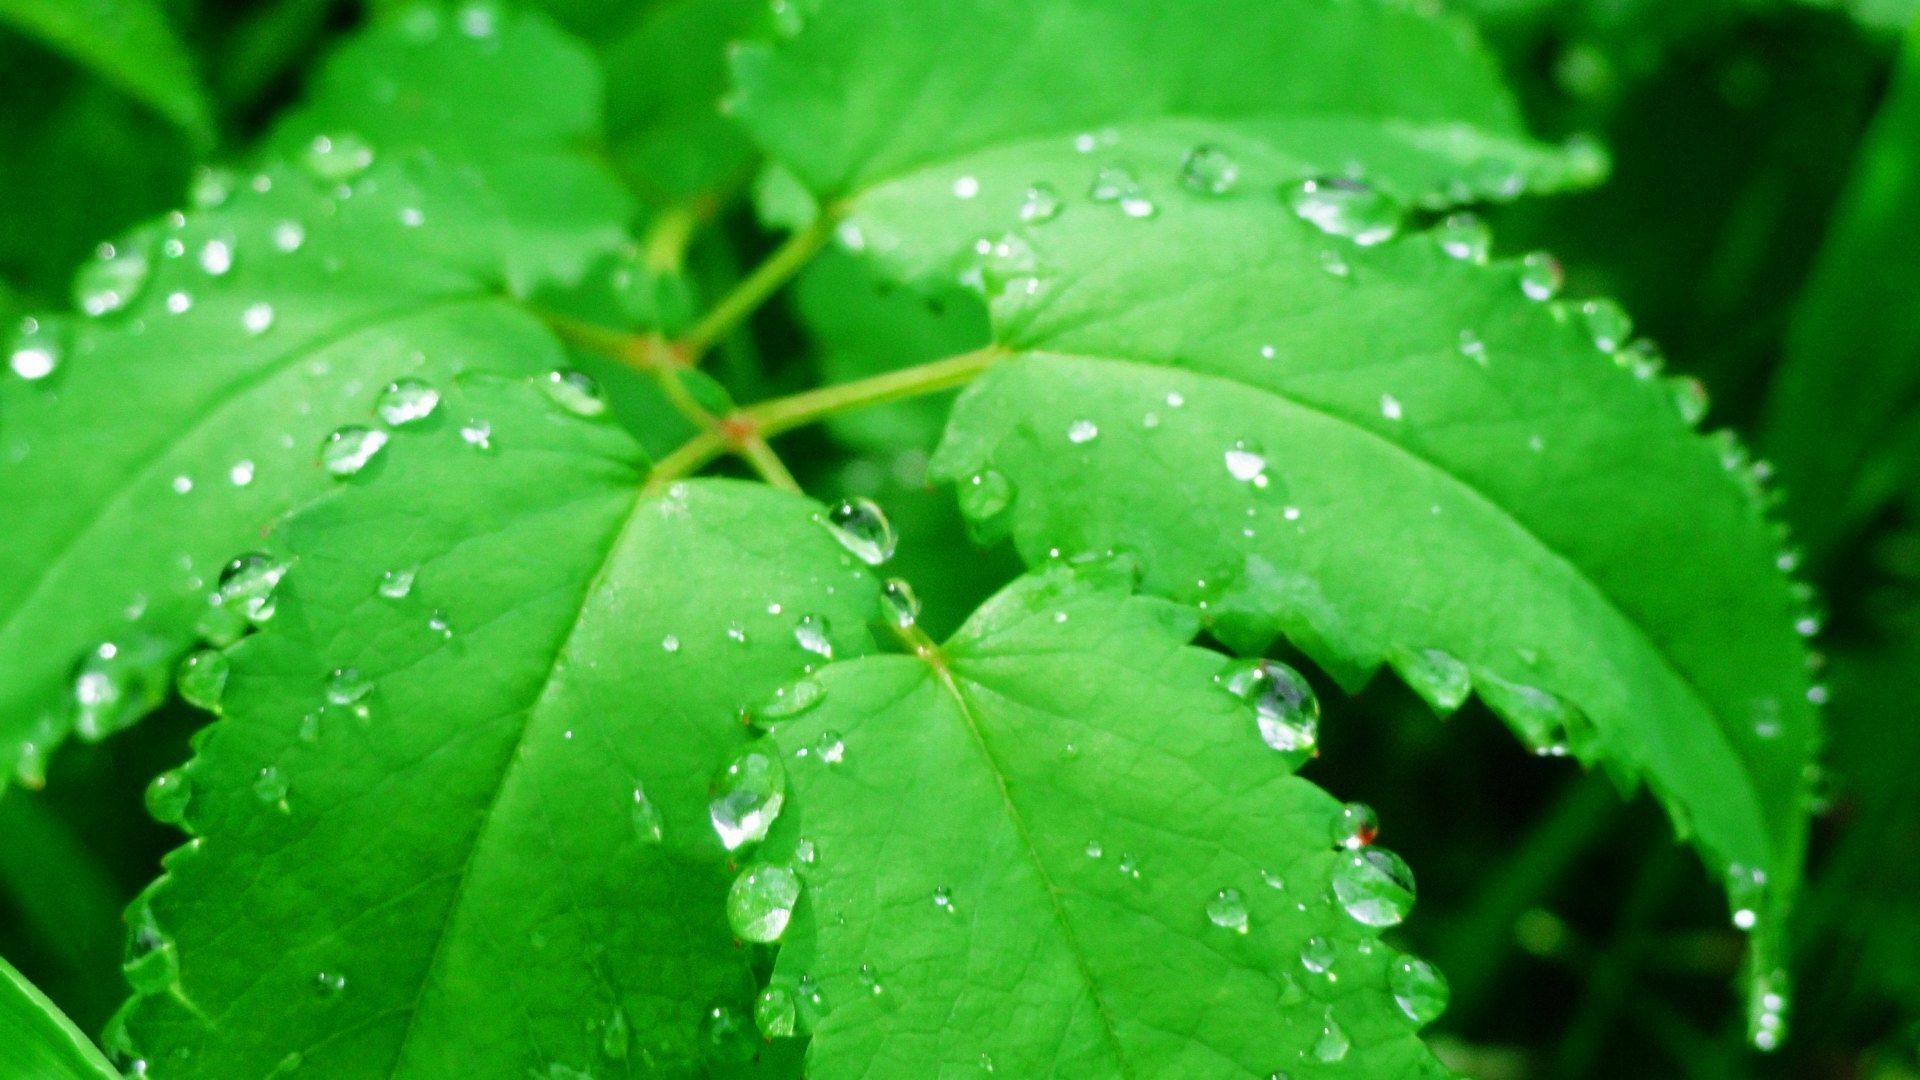 green leaf water drops wallpaper background